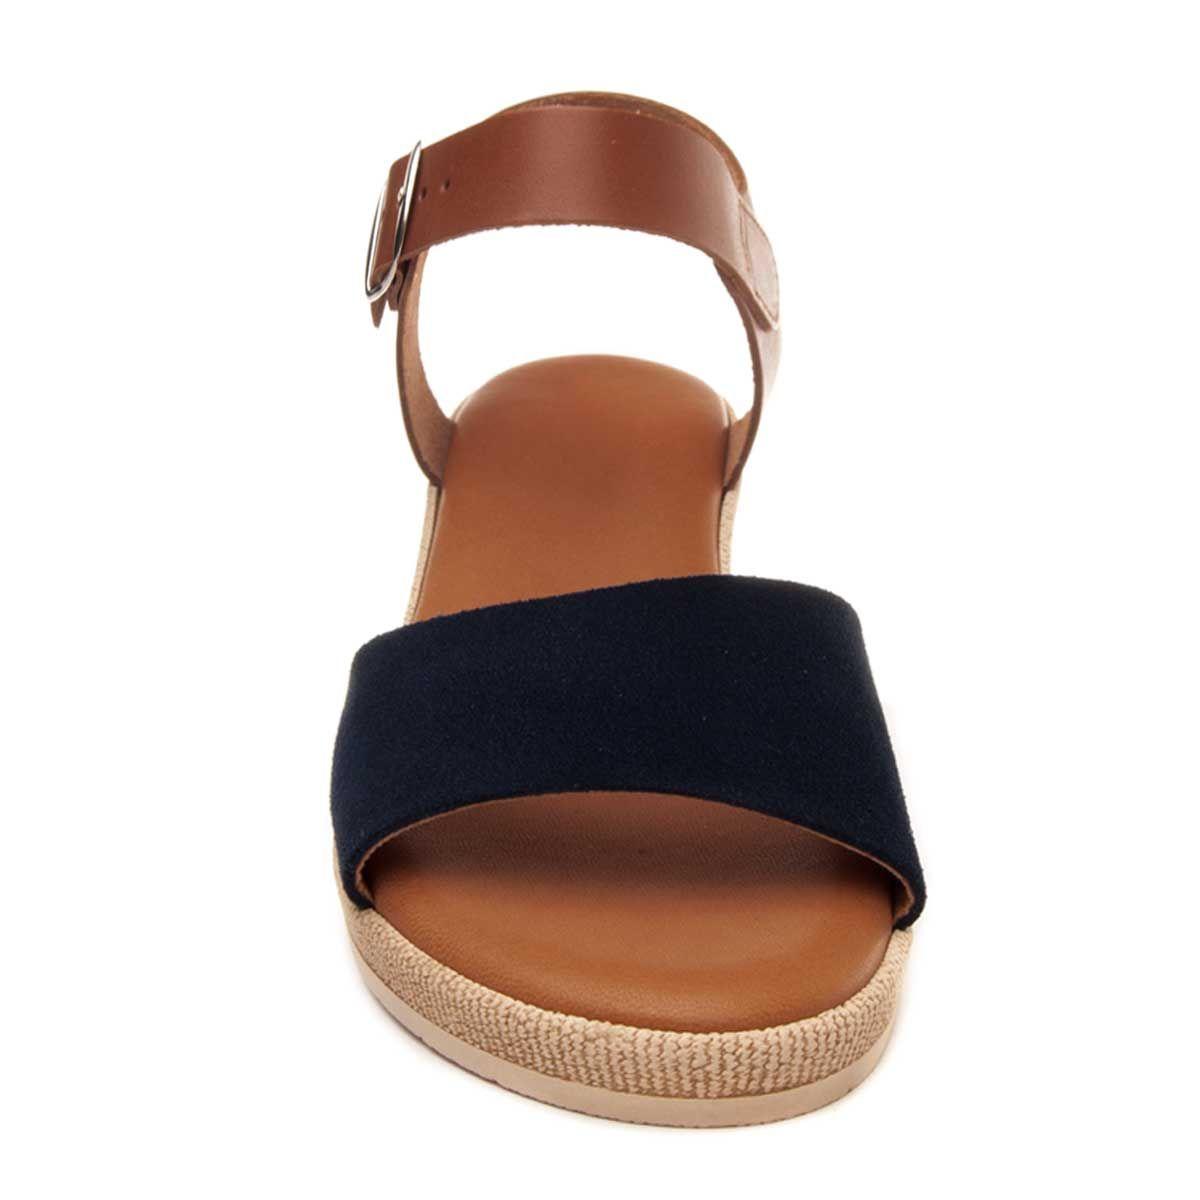 Purapiel Wedge Sandal in Blue